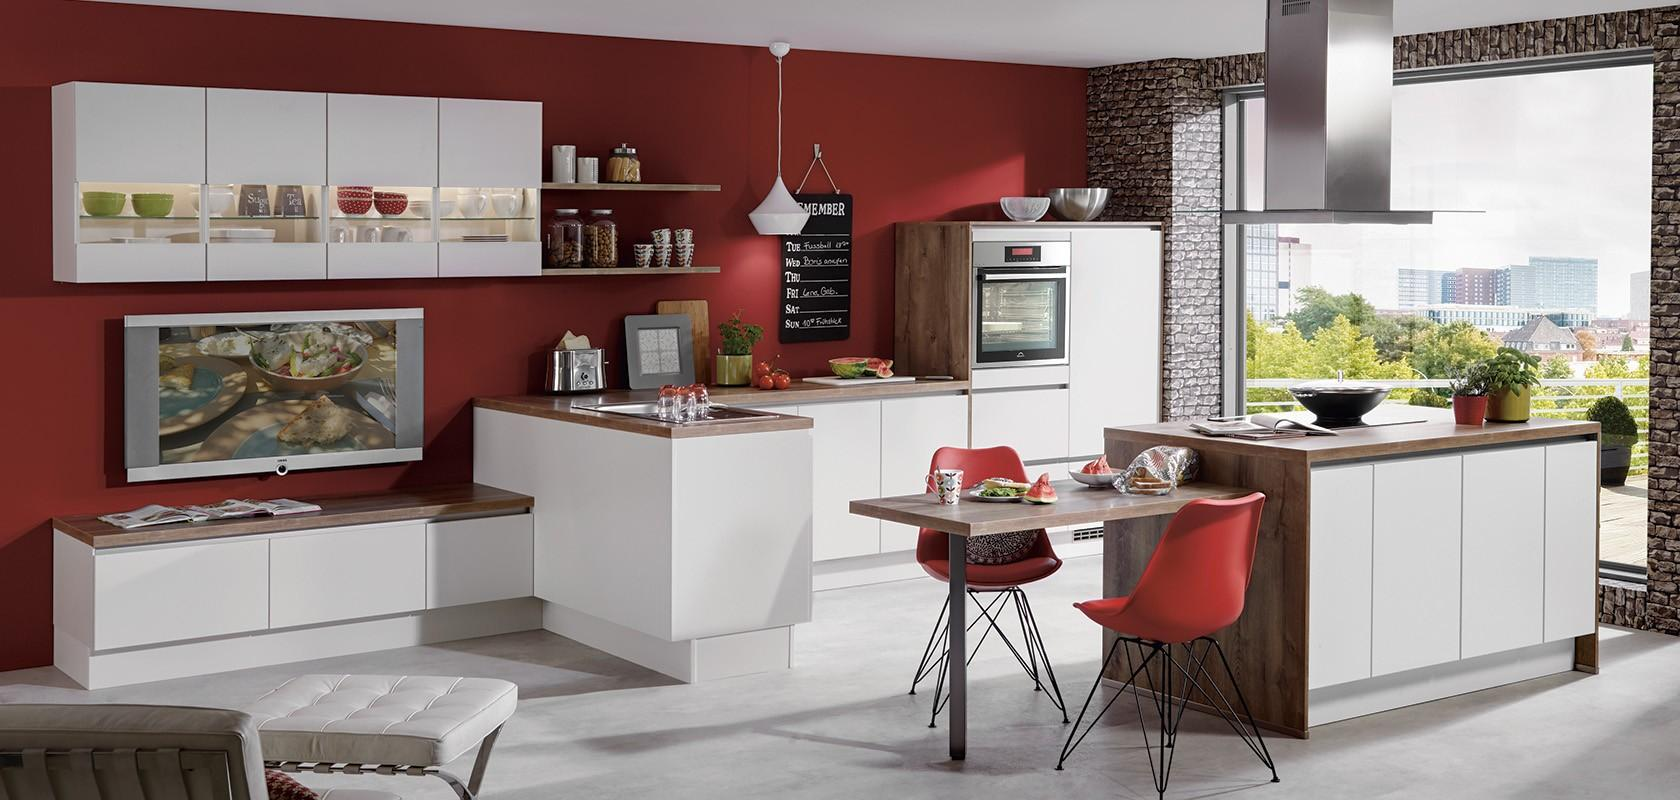 Kuhinja po meri s prirejenimi kuhinjskimi elementi